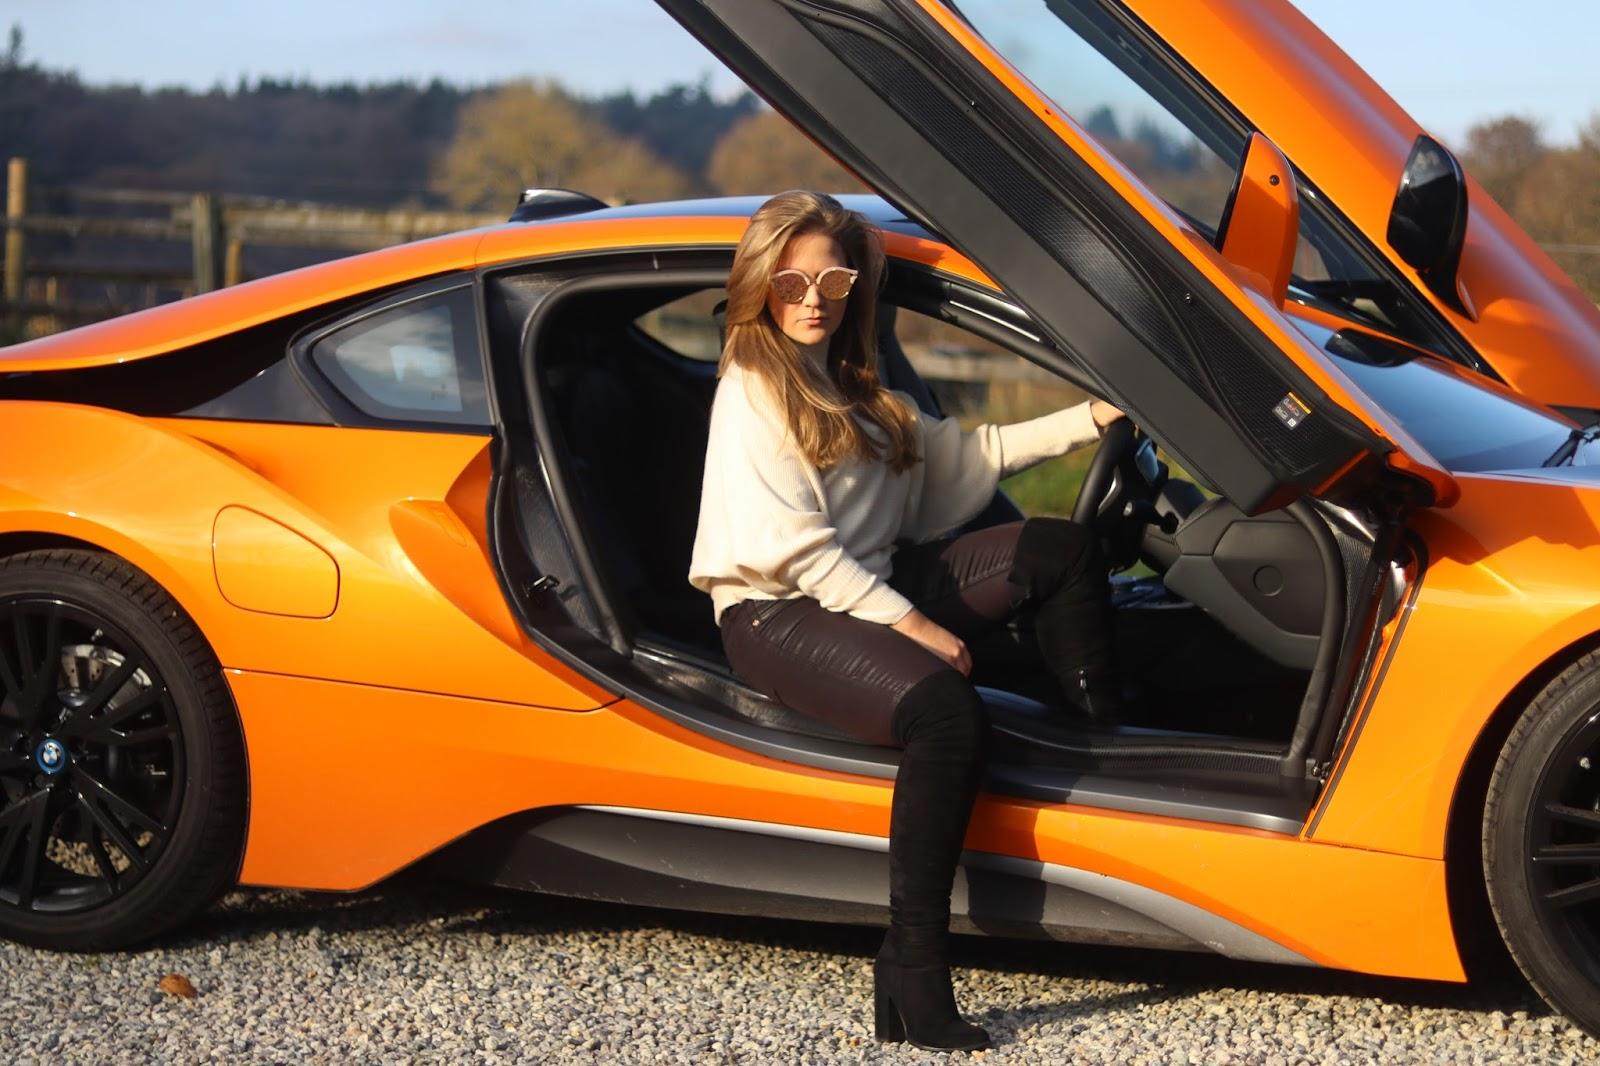 BMW I8 Supercar Bright Orange, KALANCHOE, Katie Heath